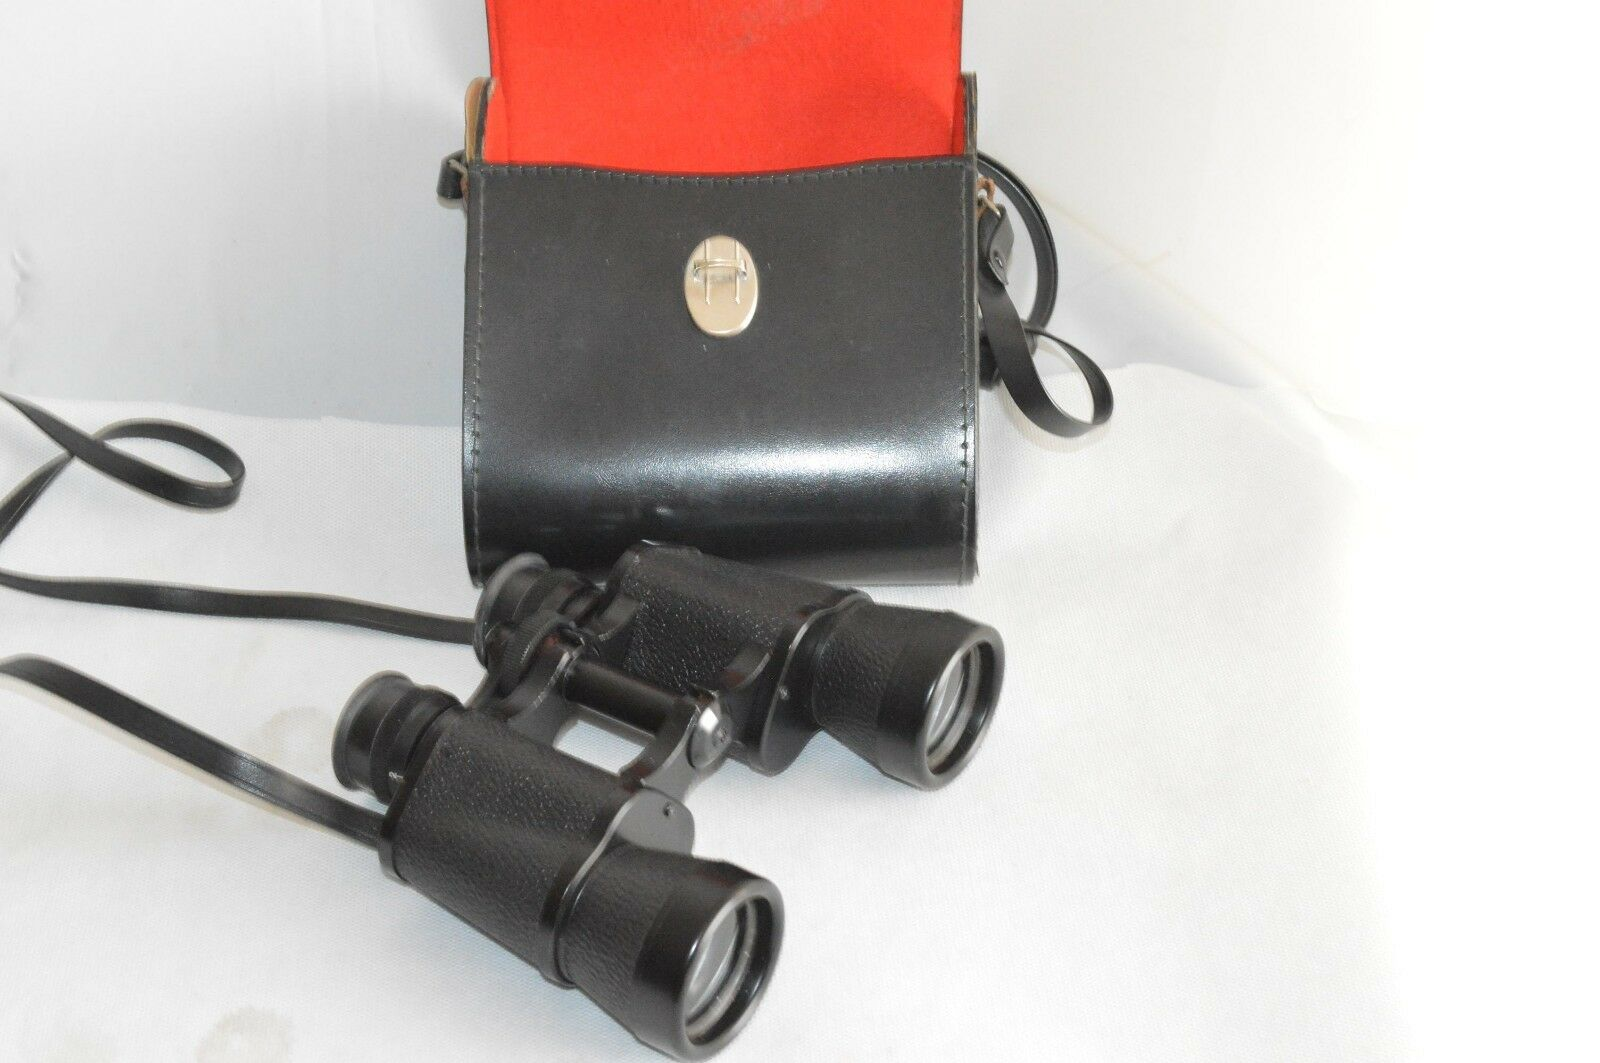 Fernglas hartmann optik 117 8 x 30 weitwinkel